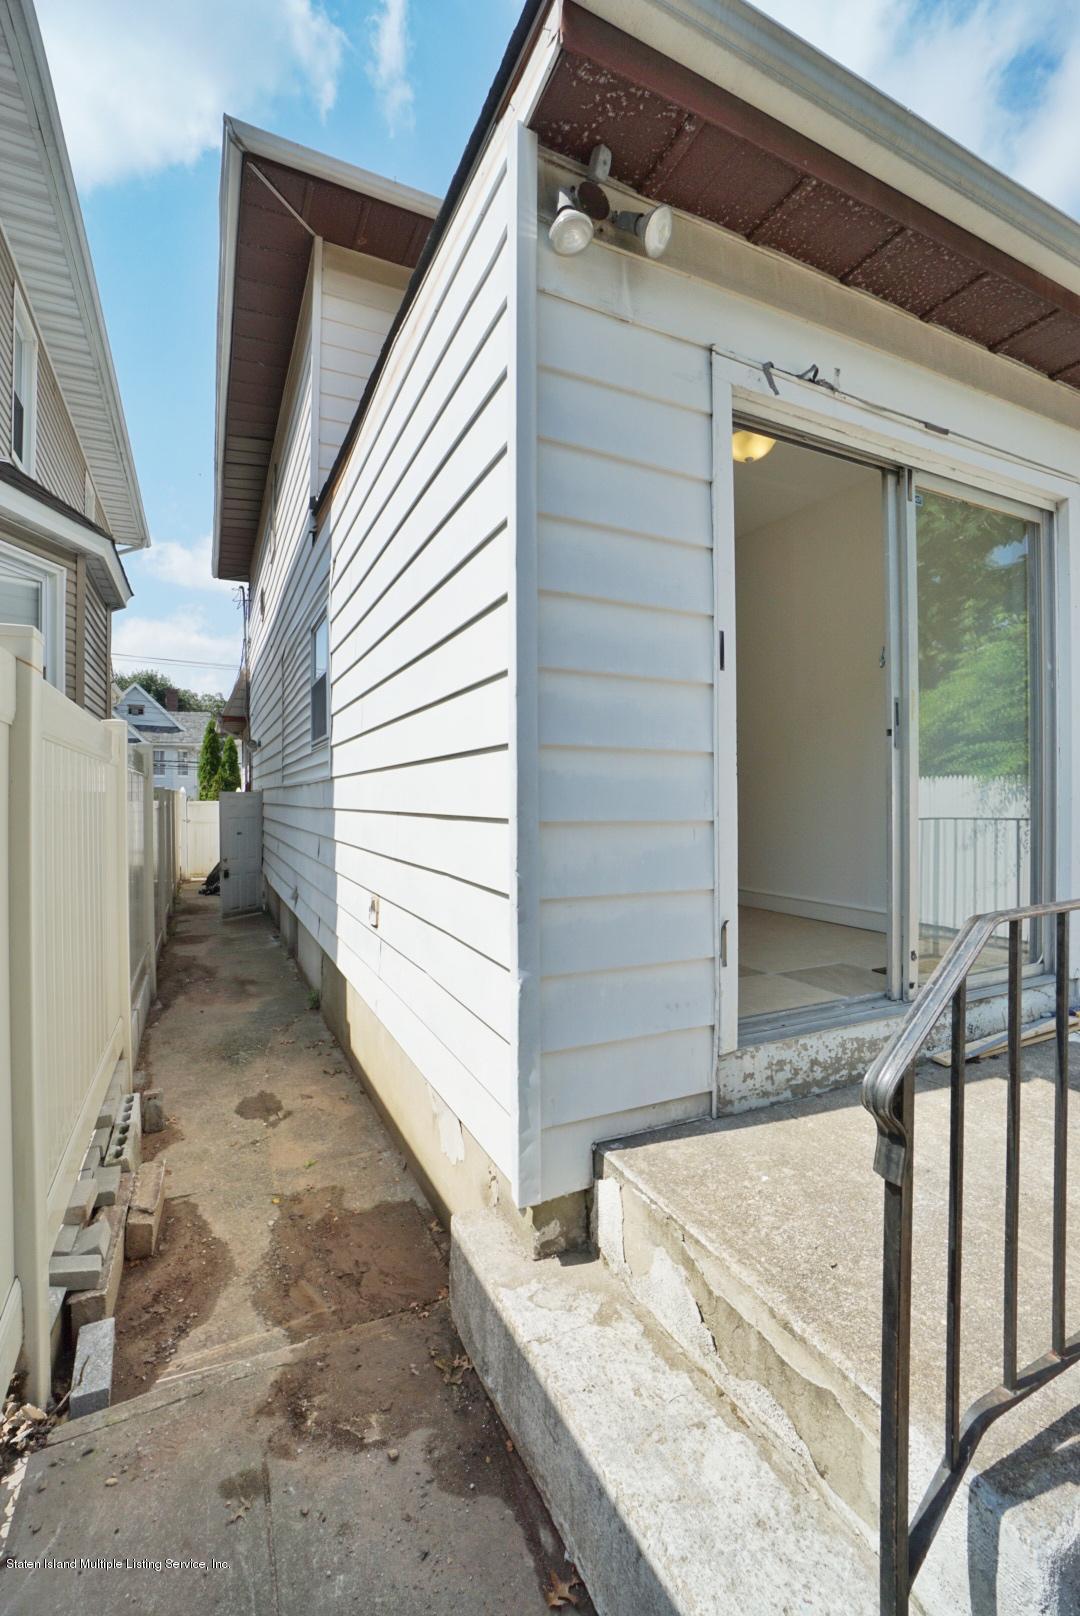 Single Family - Detached 53 Dubois Avenue  Staten Island, NY 10310, MLS-1128749-45